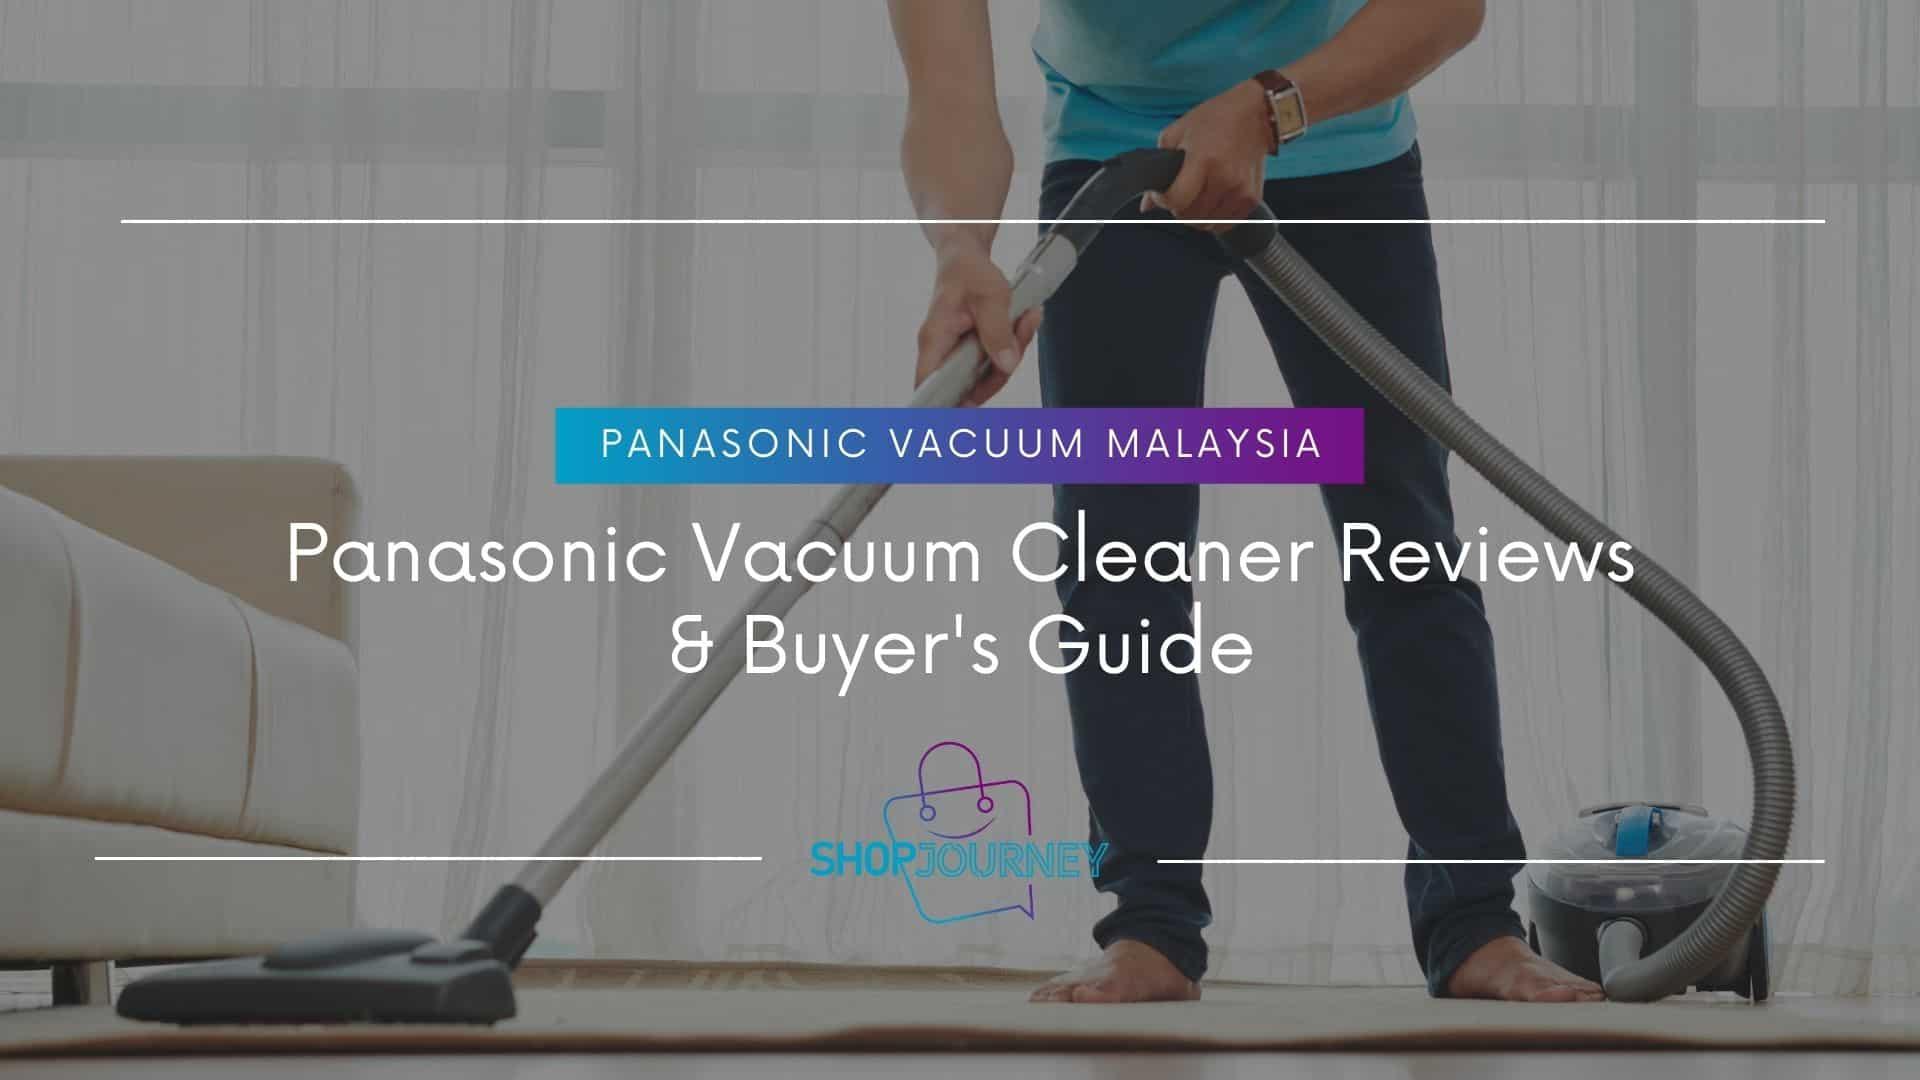 Panasonic Vacuum Cleaner Reviews - Shop Journey